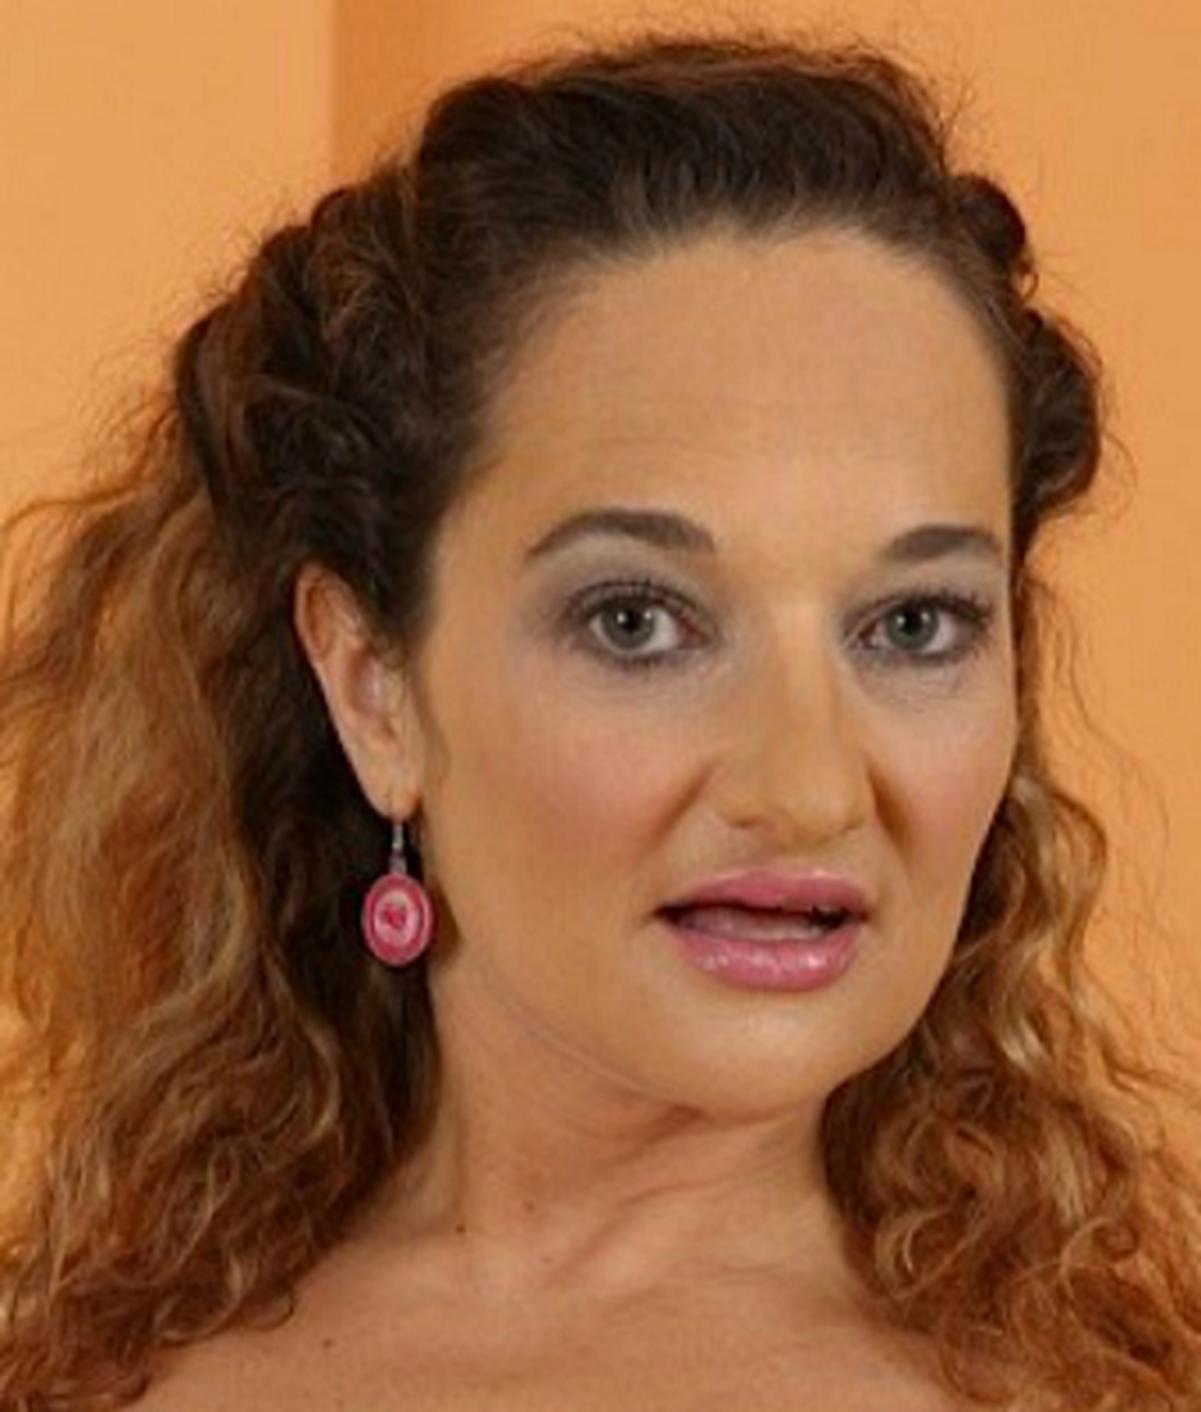 Ameli Monk